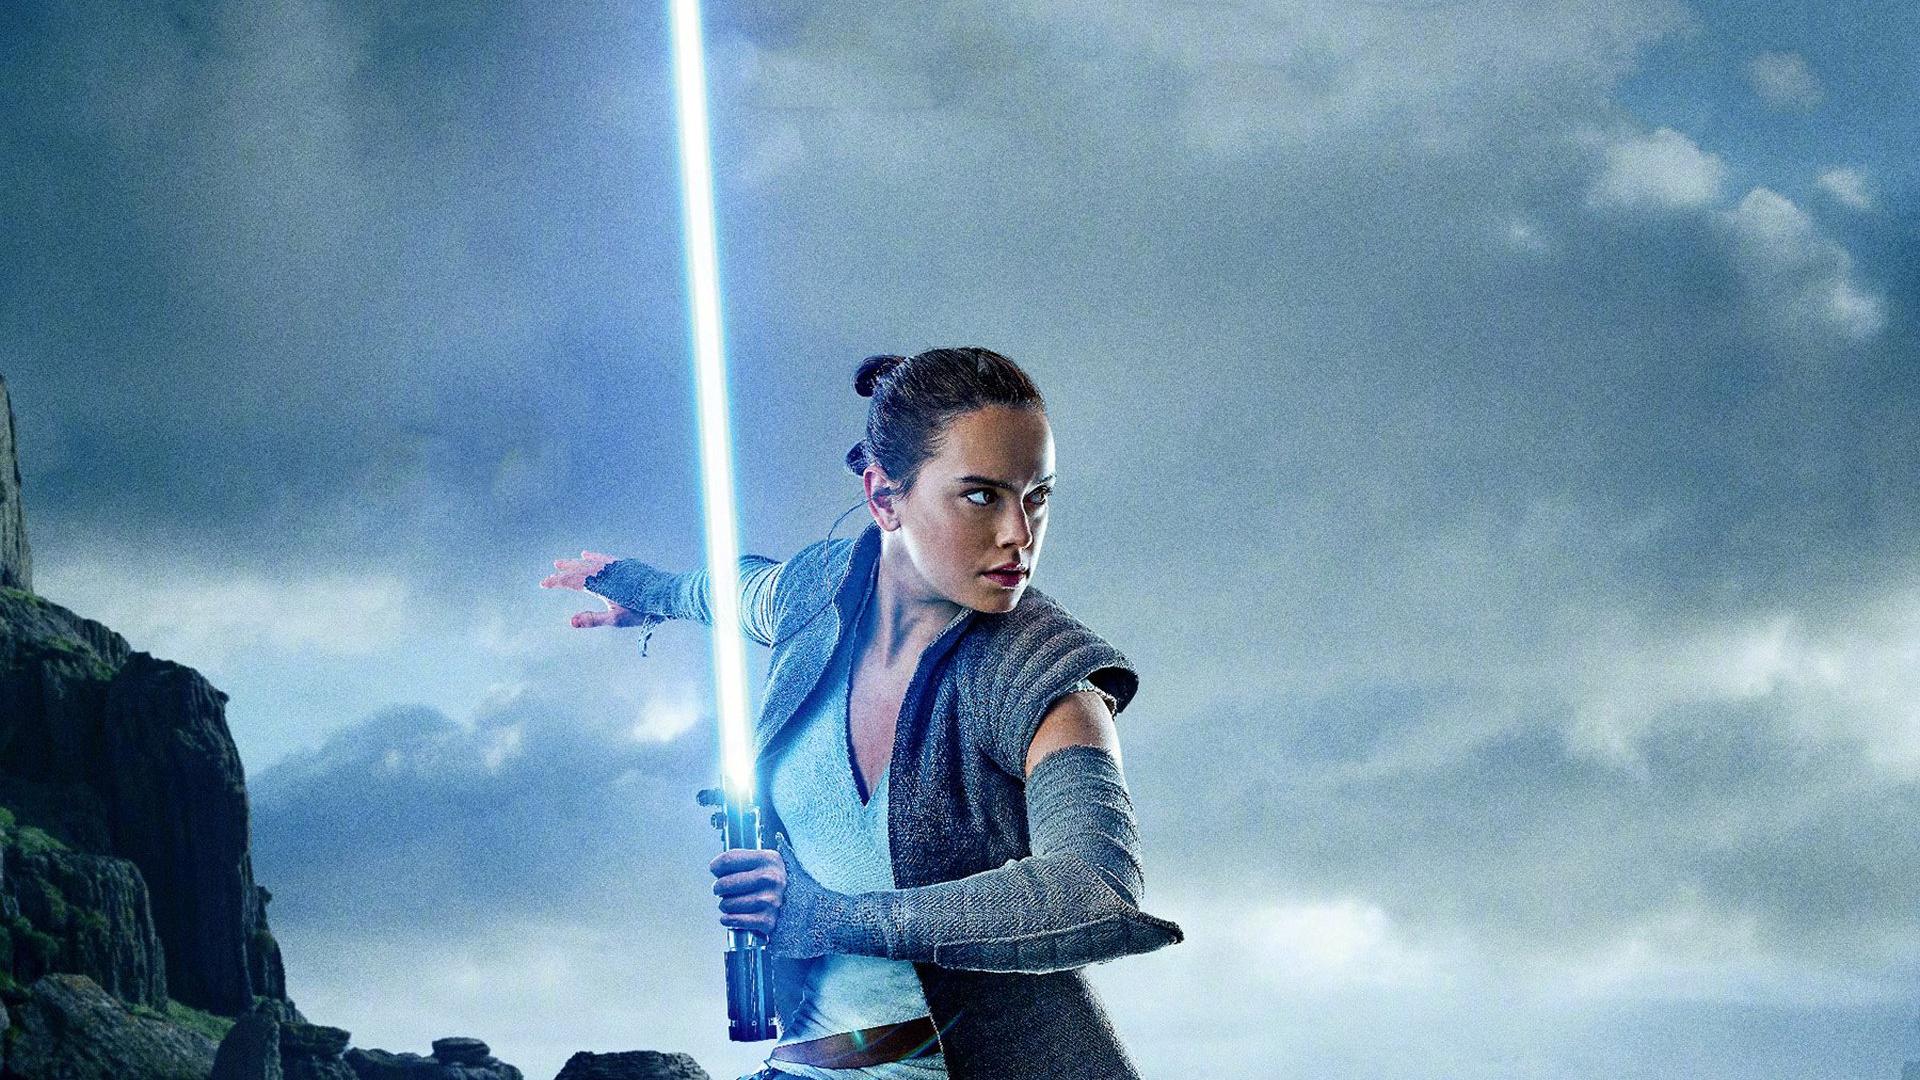 Free Download Rey In Star Wars The Last Jedi Wallpaper 1920x1450